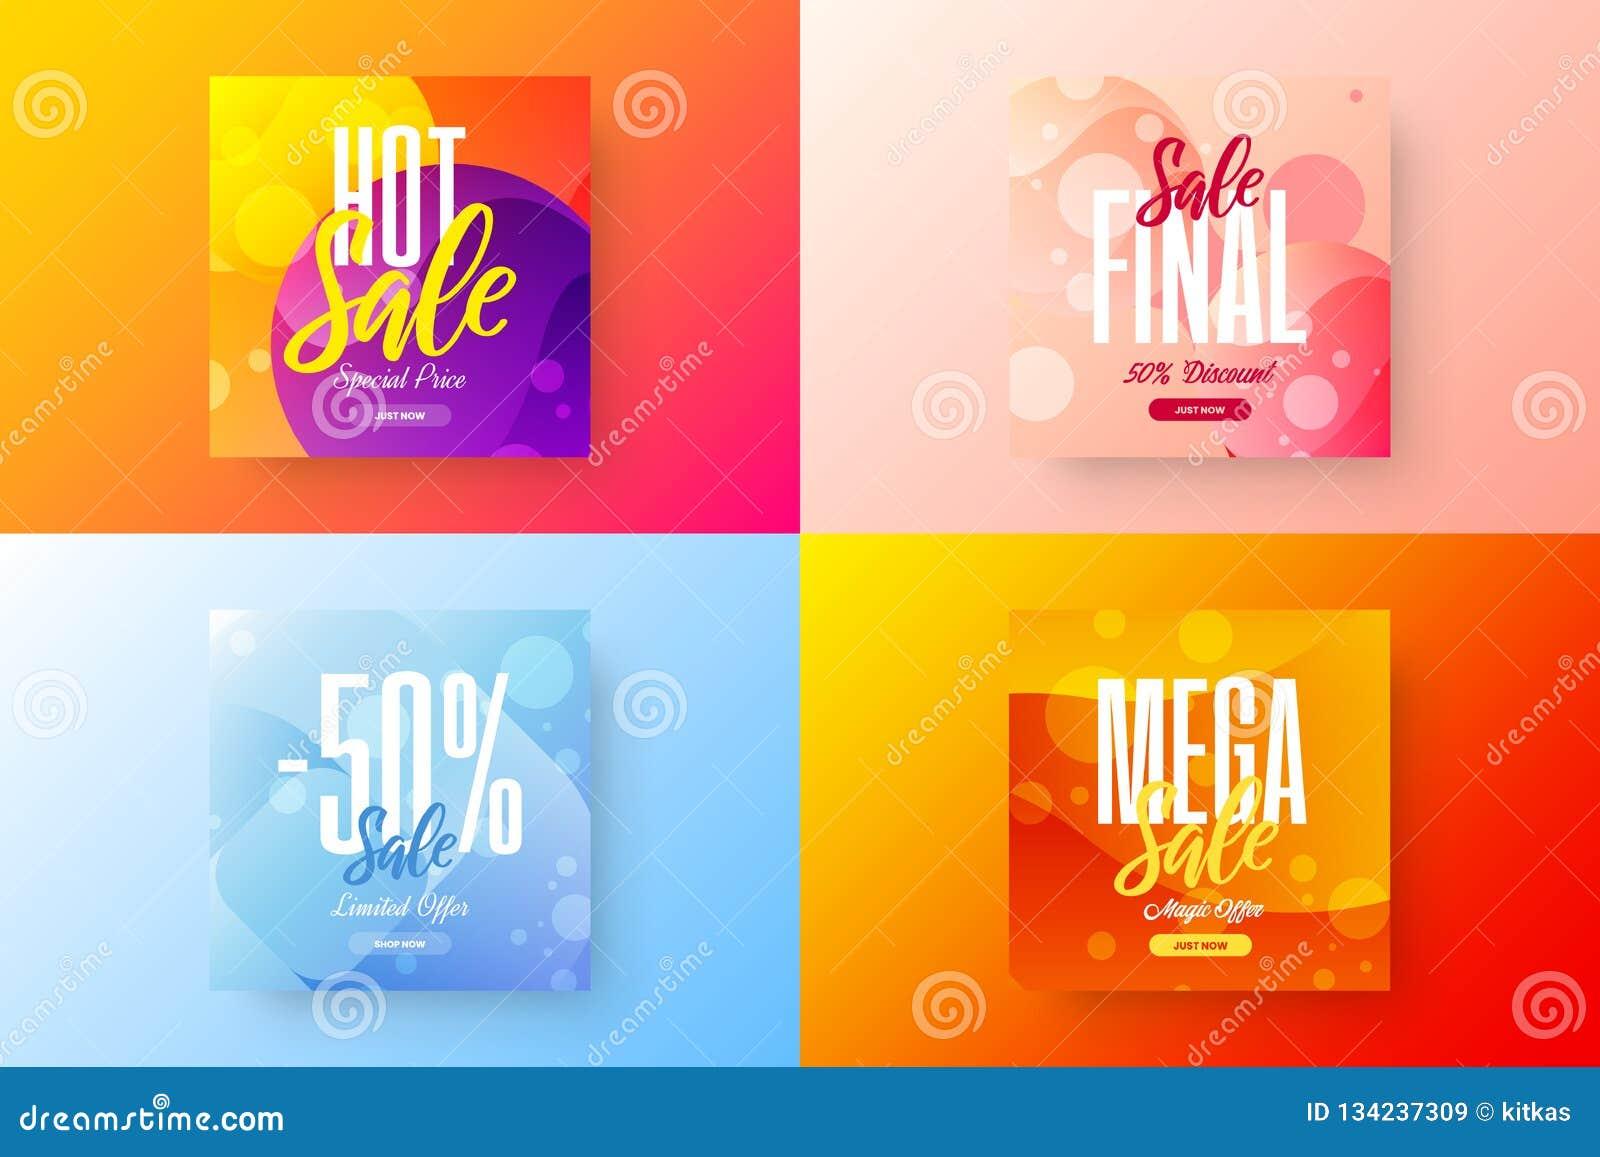 Sale vector banner template bundle. Special offer discount social media illustration layout set. Advertising shopping design.